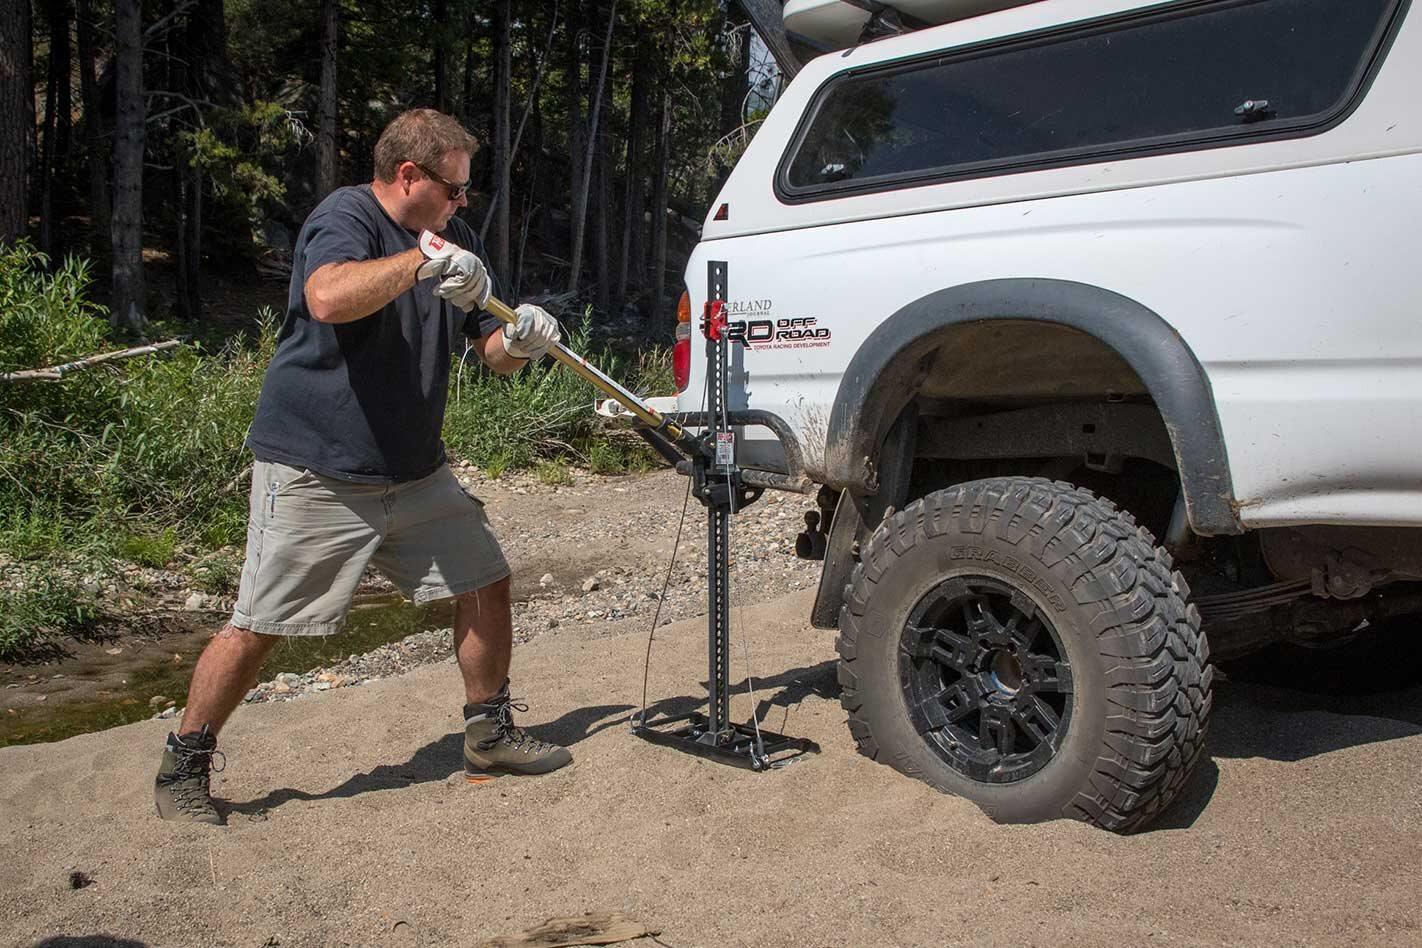 All-terrain jacks comparison test 4x4 product test